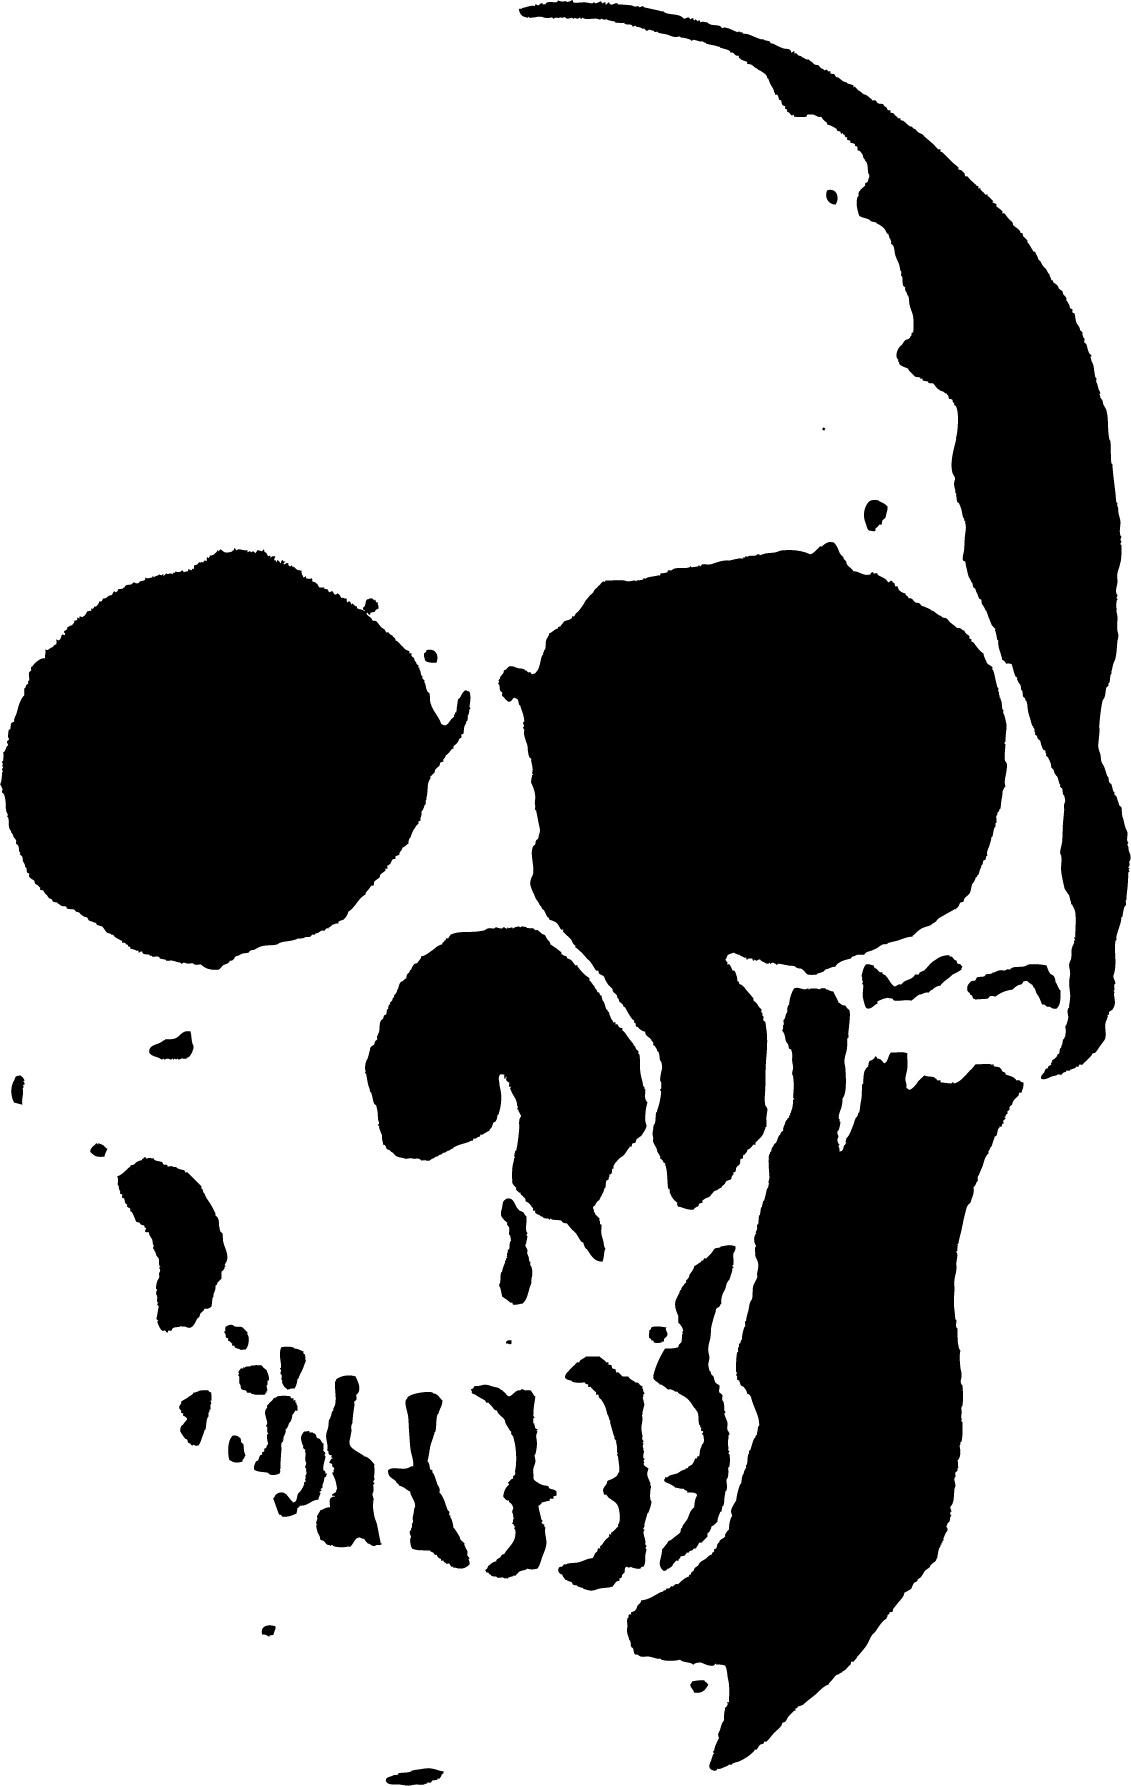 23 Free Skull Stencil Printable Templates | Guide Patterns - Free Printable Stencil Designs